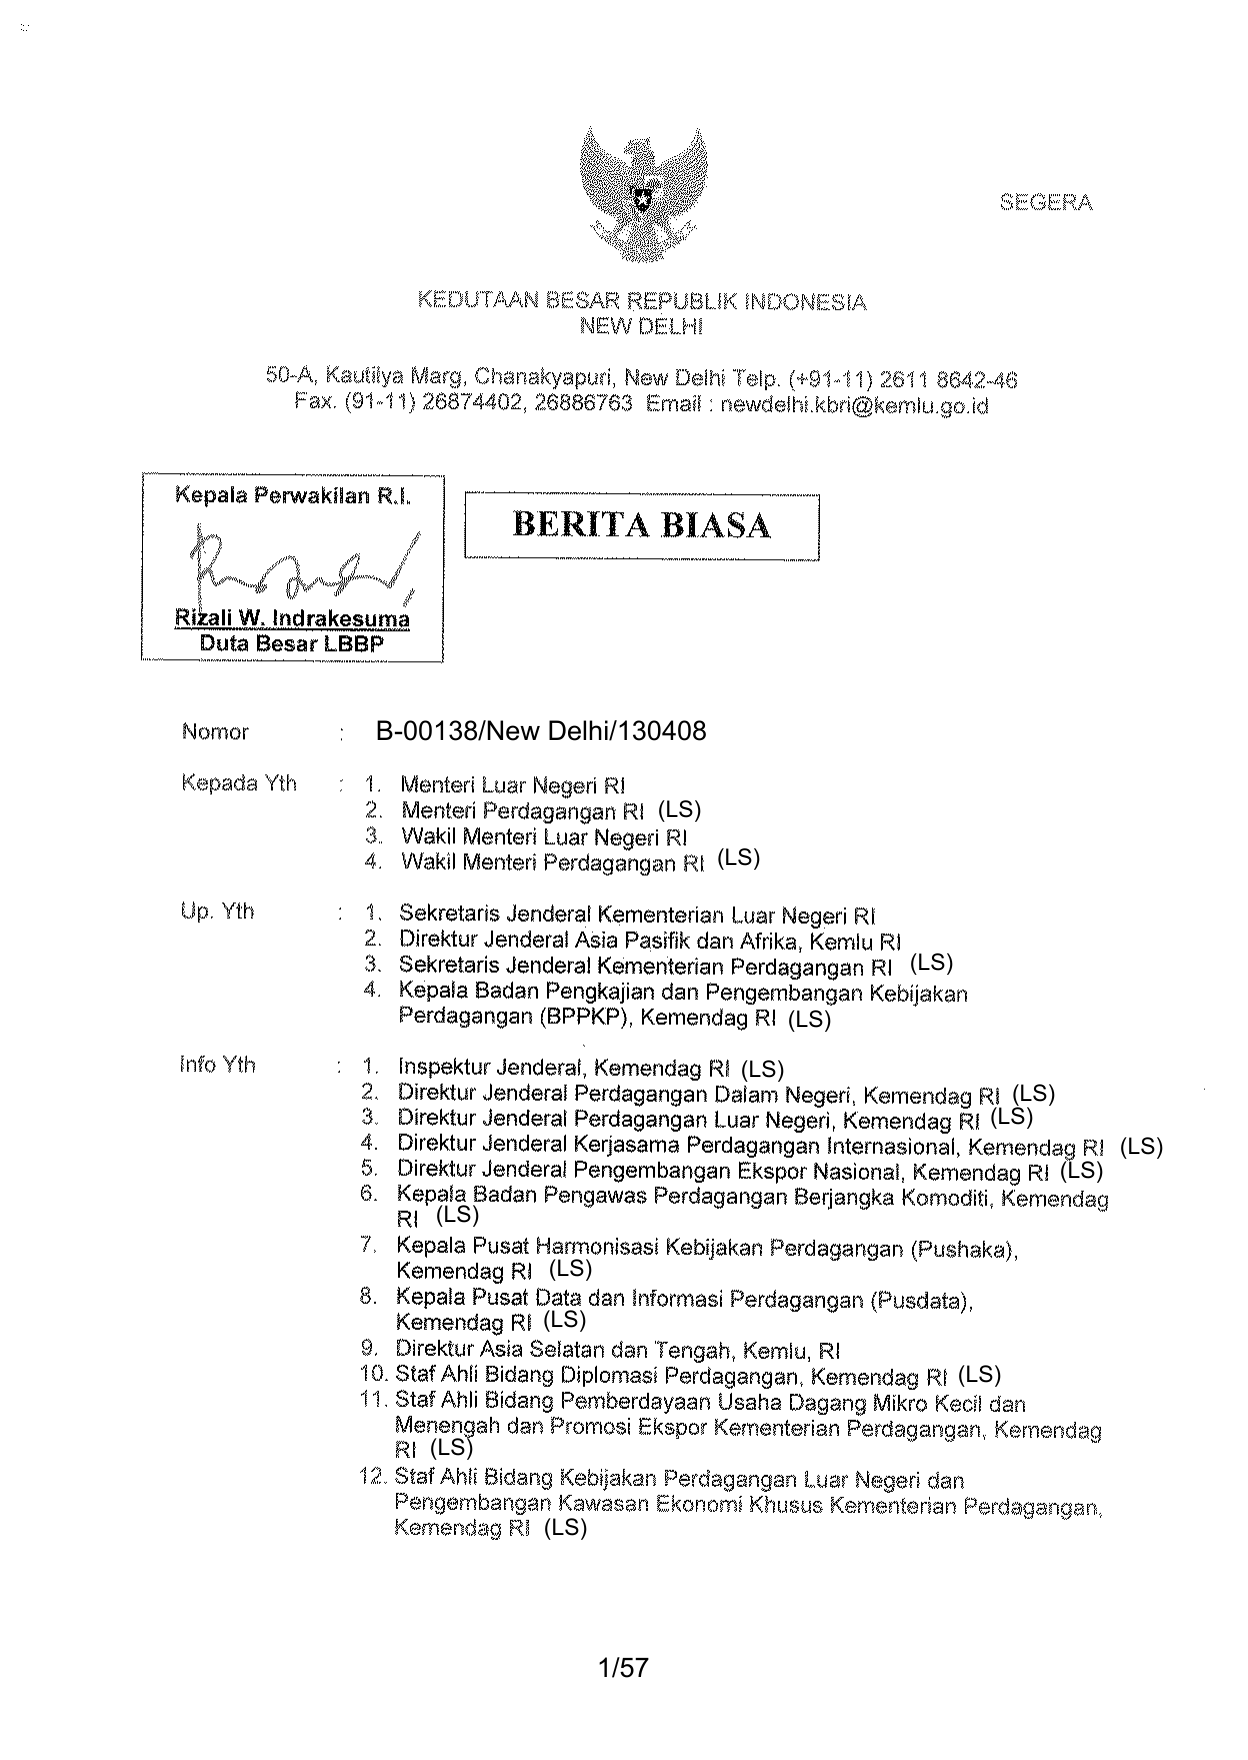 Kementerian Perdagangan Republik Indonesia - Wikipedia bahasa Indonesia, ensiklopedia bebas